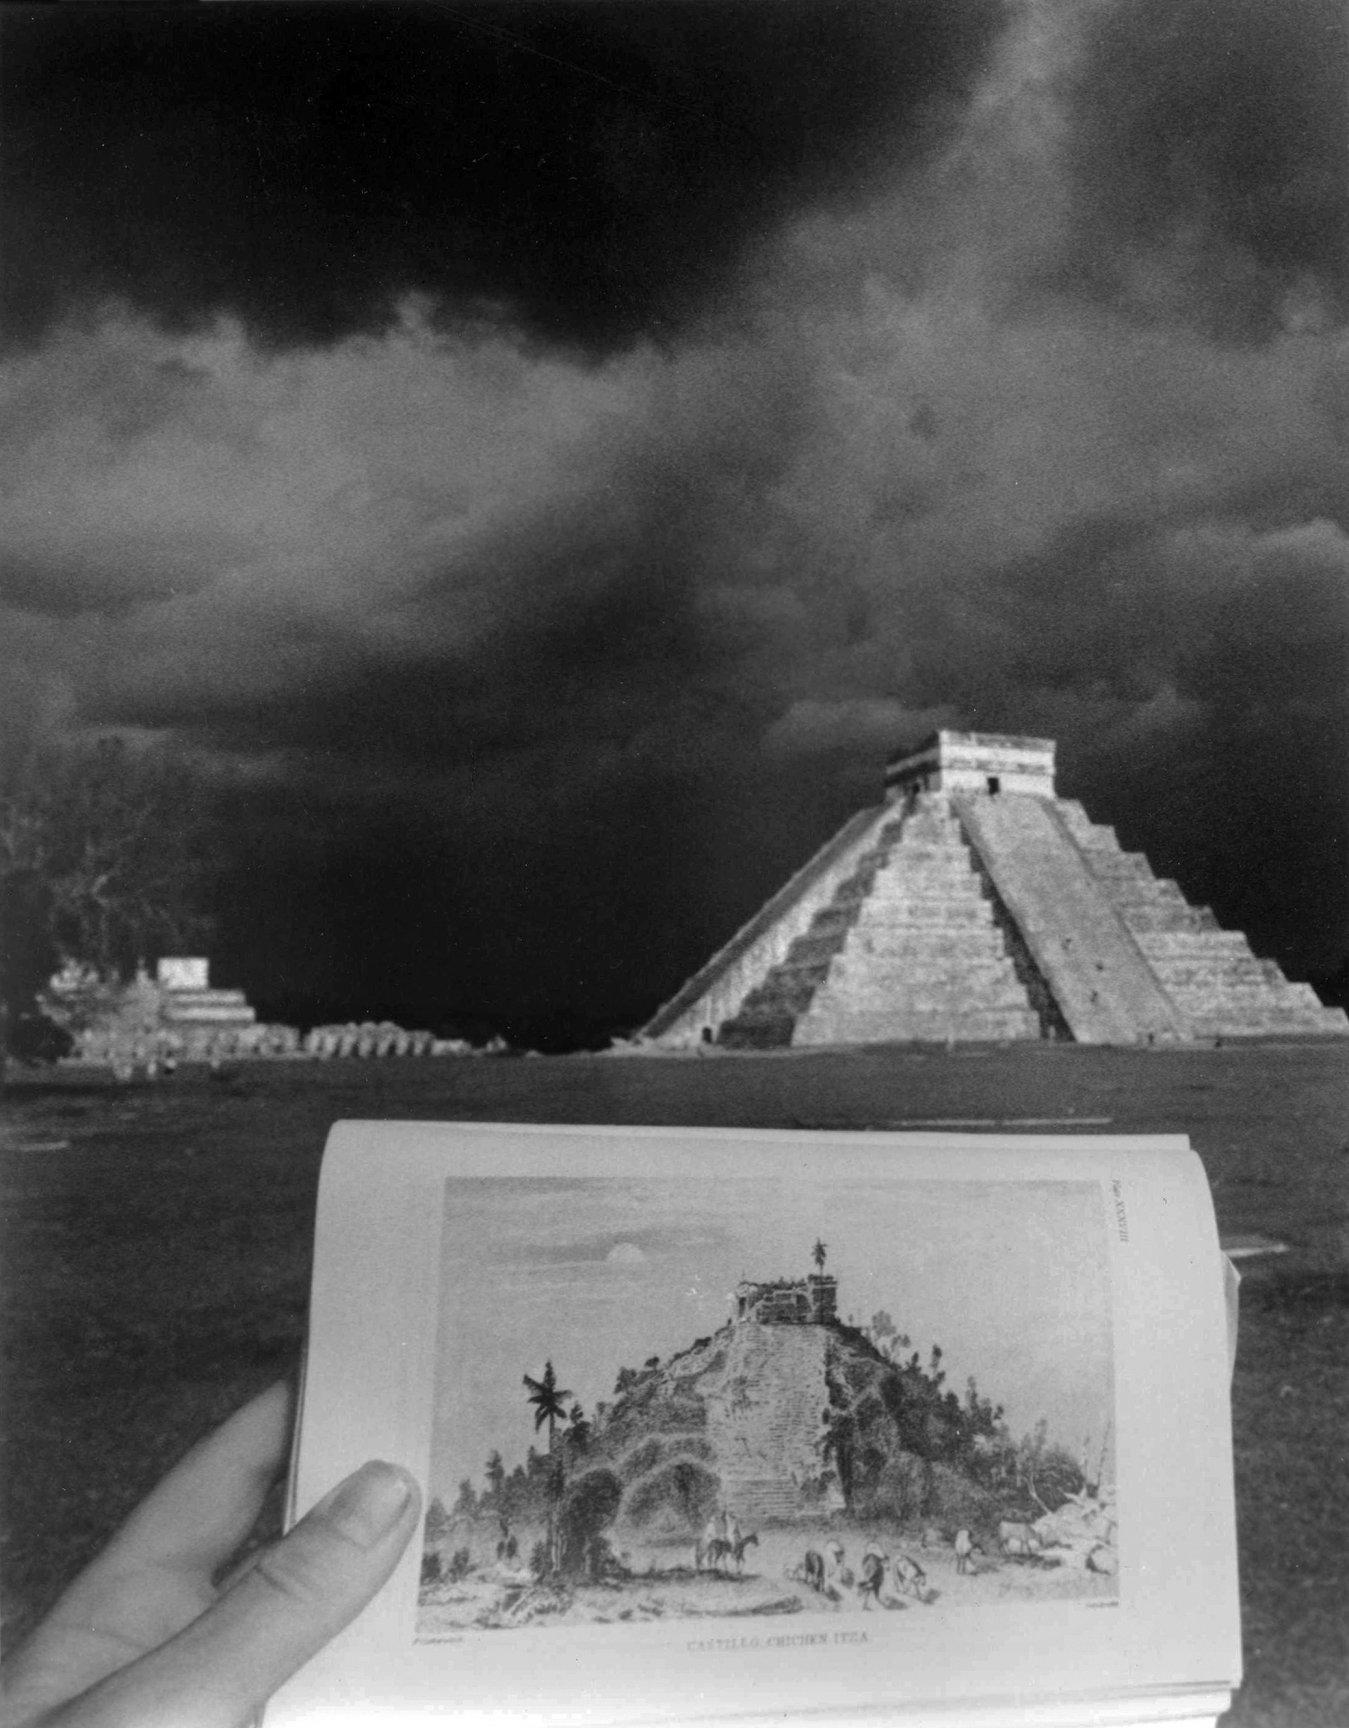 El Castillo, Chichen Itzá after Catherwood (1985) - Leandro Katz